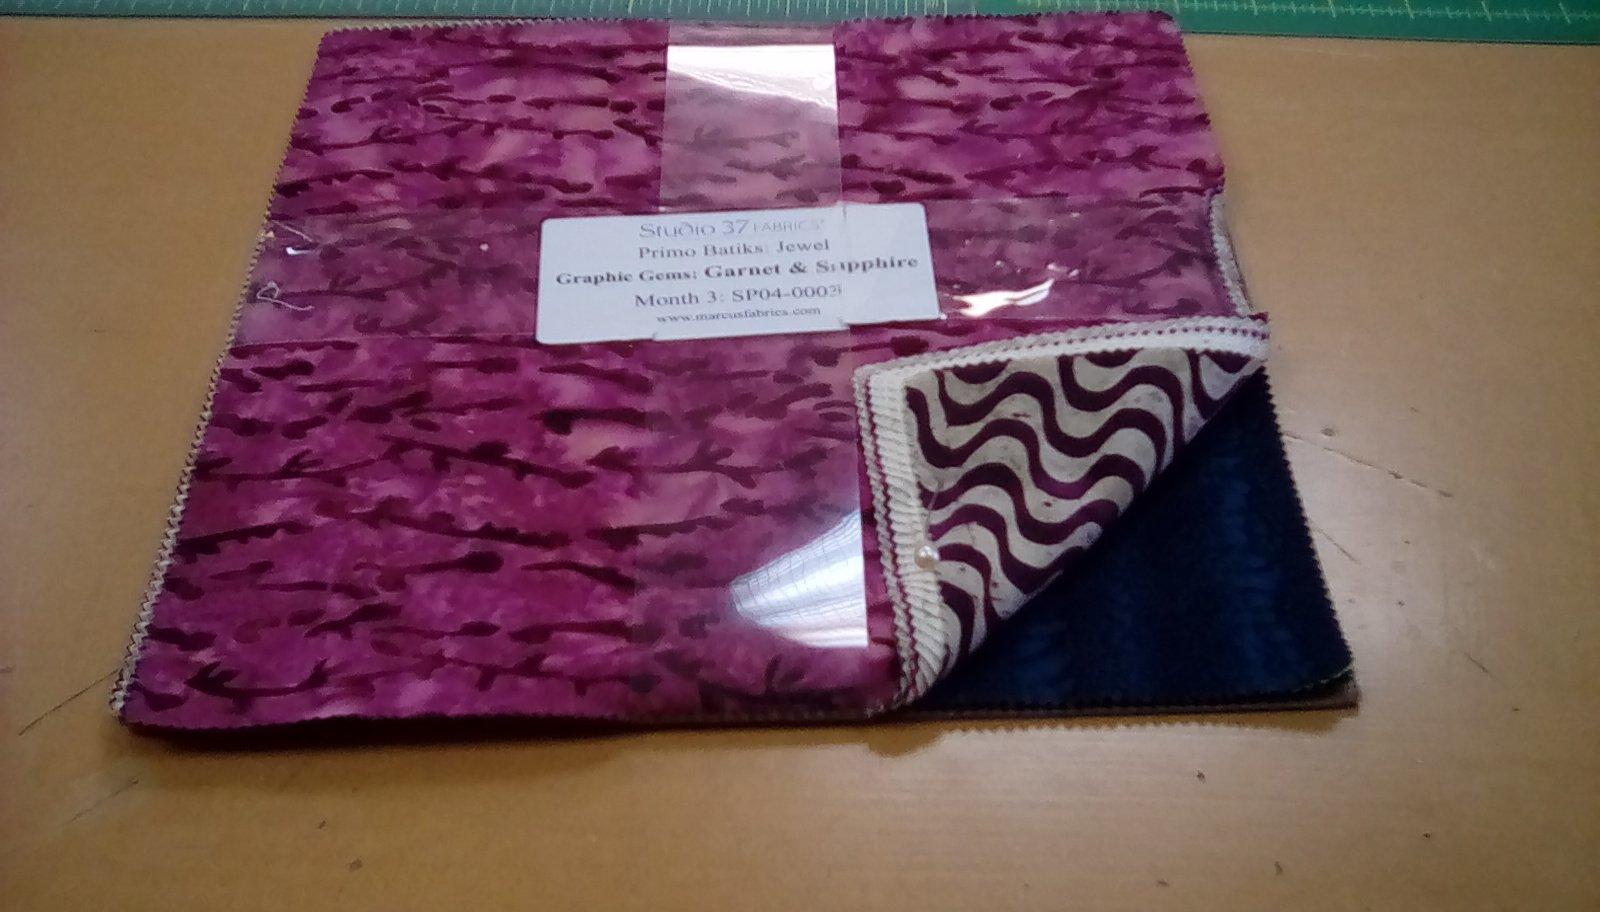 Primo Batiks:Jewel Graphic Gems: Garnet & Sapphire Month 3